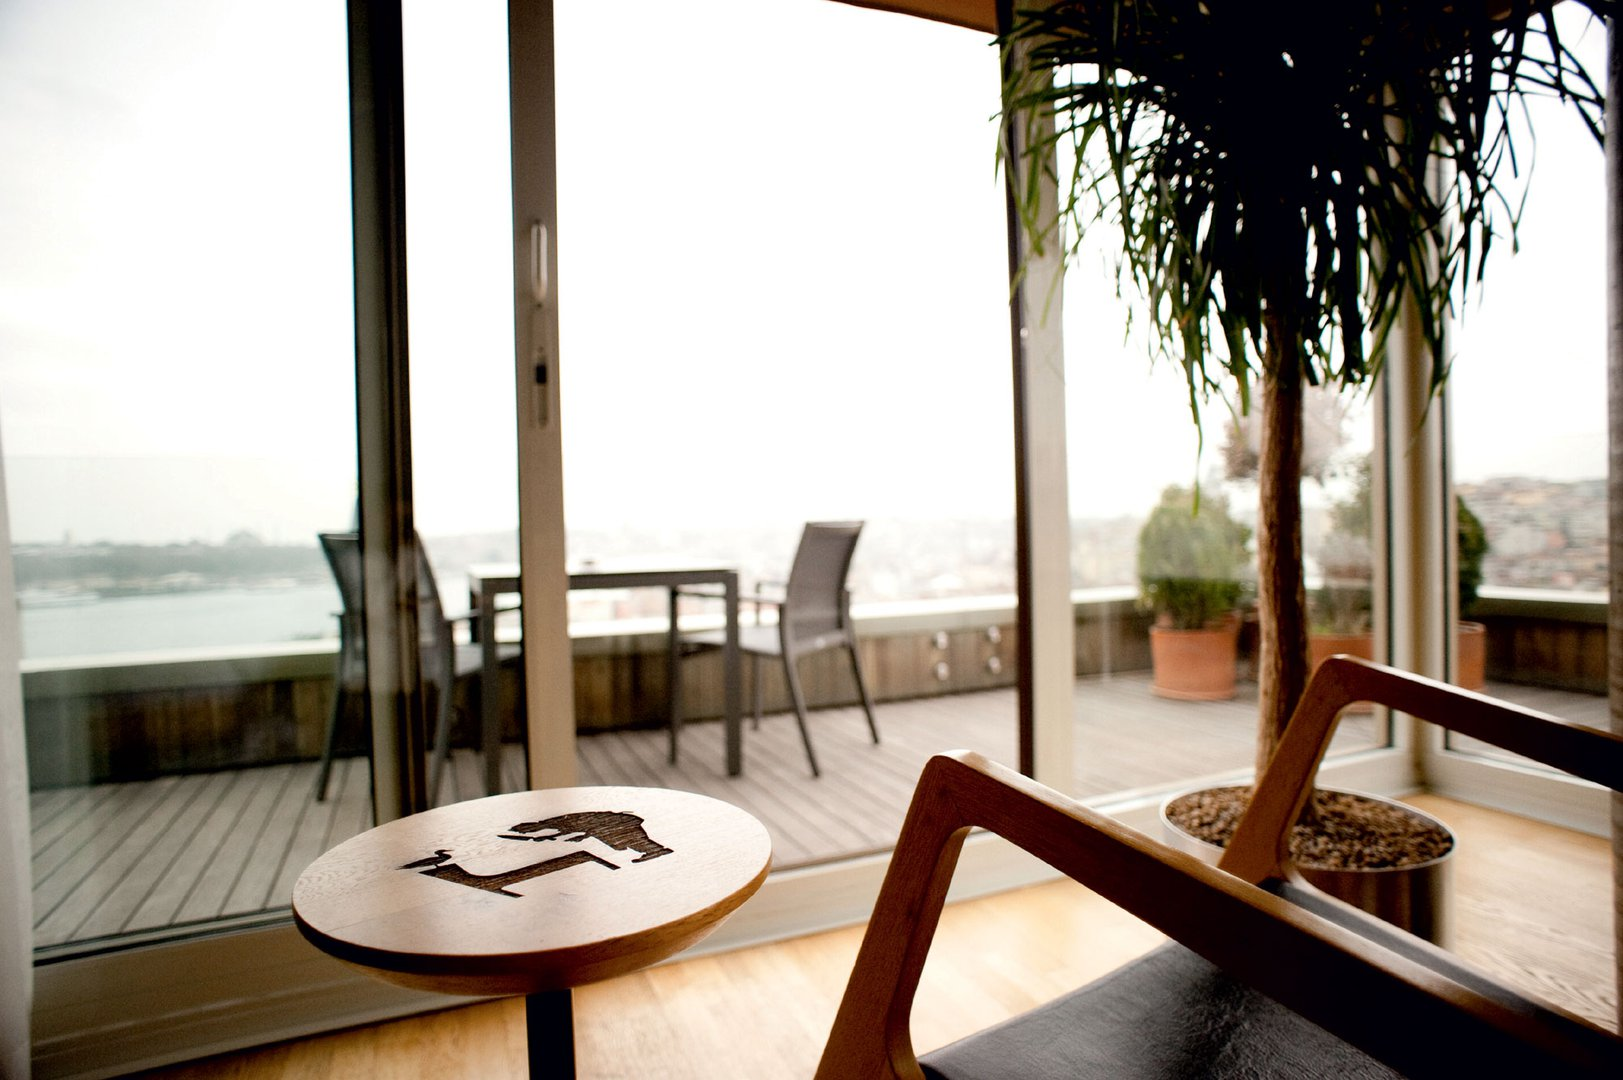 Hotel witt istanbul buti na oaza sredi velemesta dekor for Dekor hotel